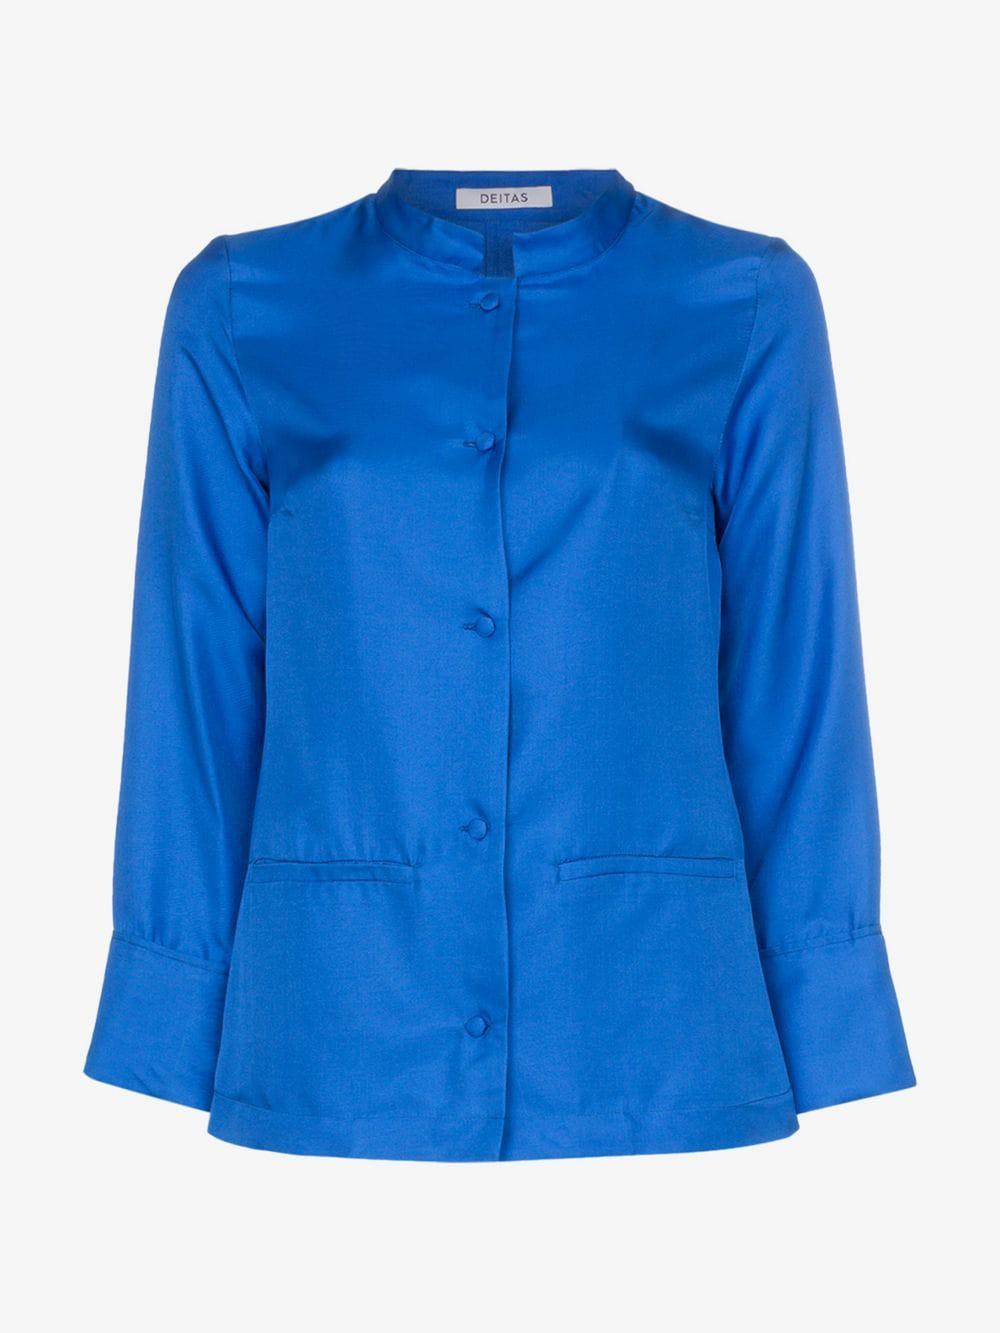 Deitas China silk shirt in blue